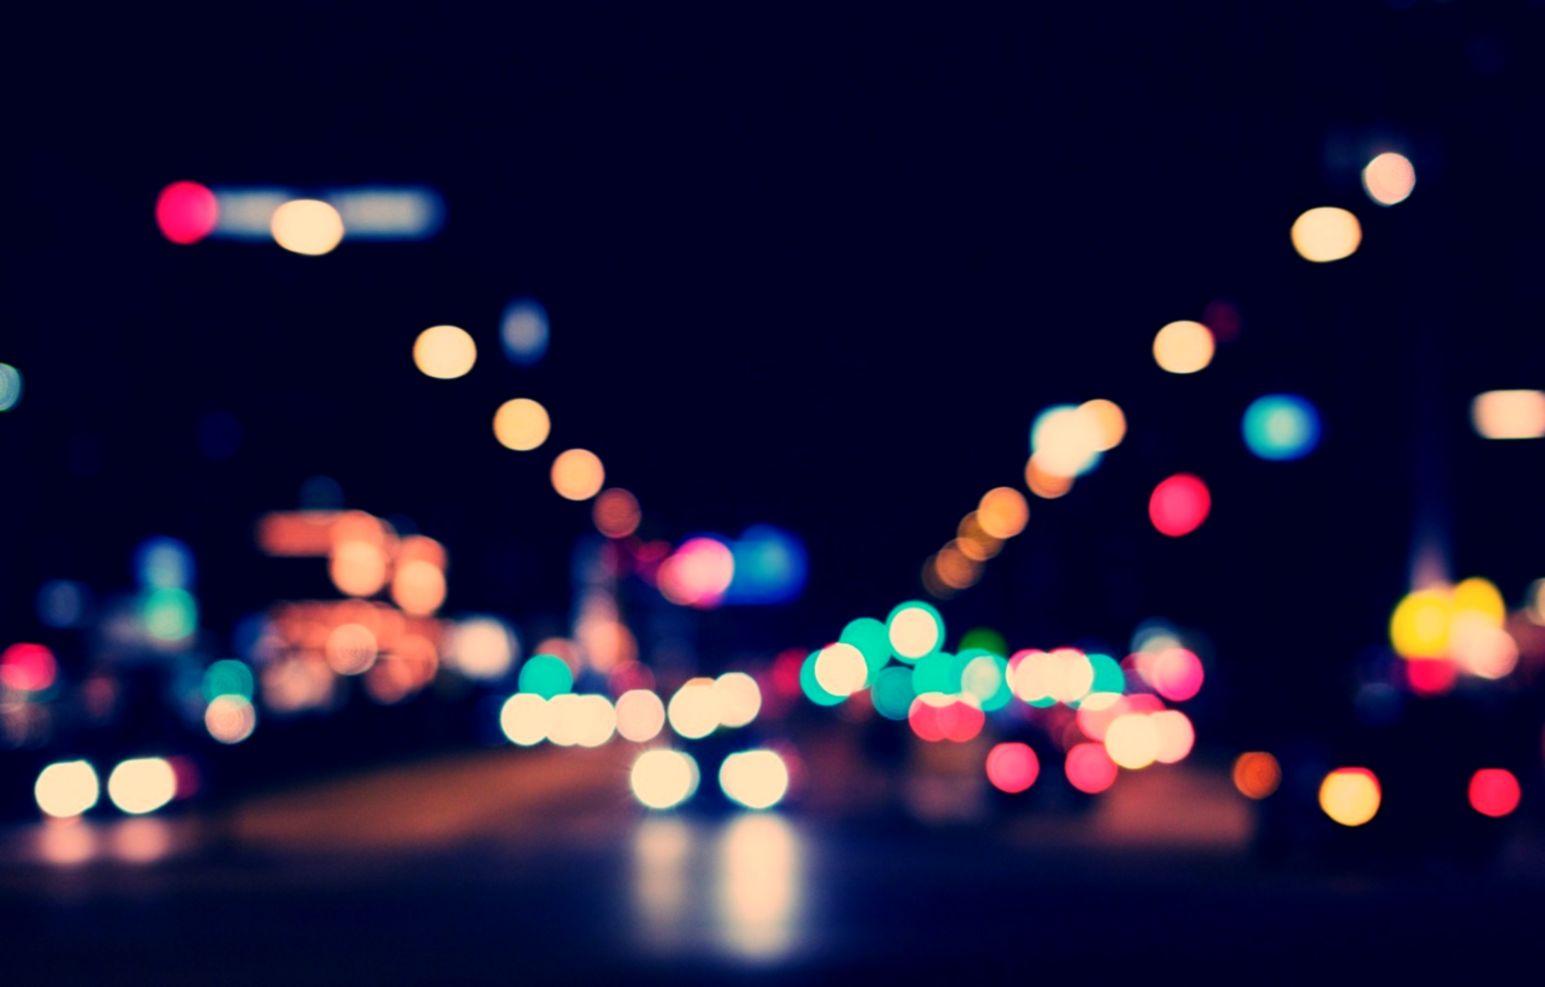 Street Night Light Photo Hd Wallpaper Smart Wallpapers